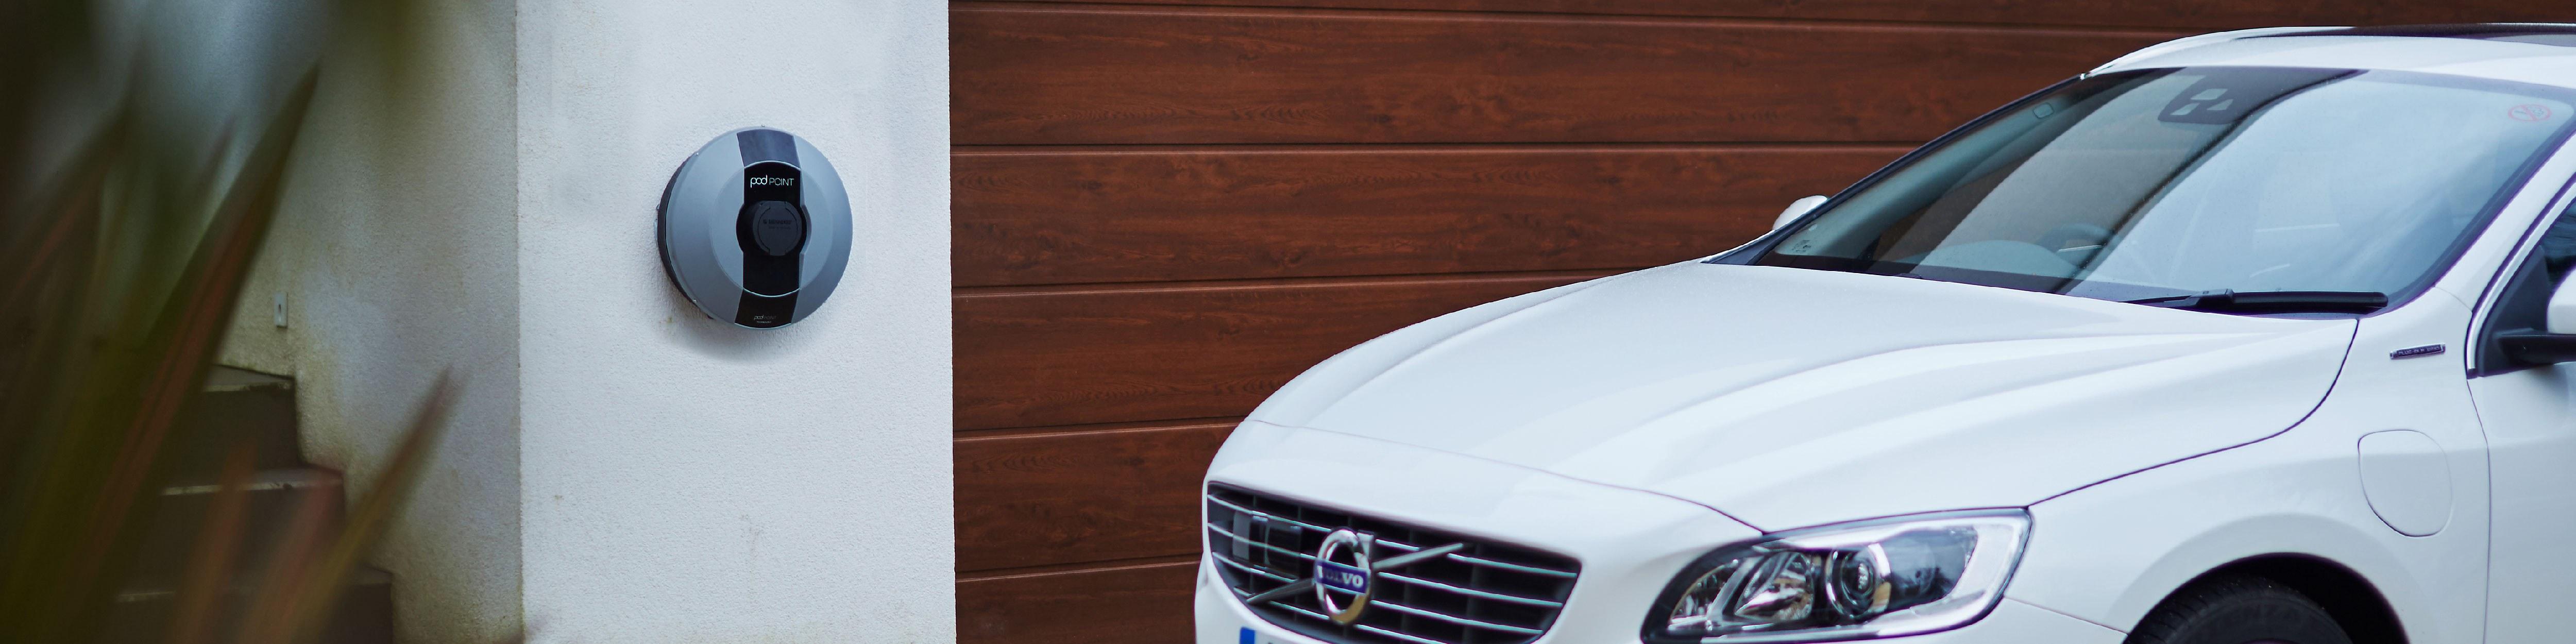 Volvo-Cars-UK-blog-post-artwork-01-01-01